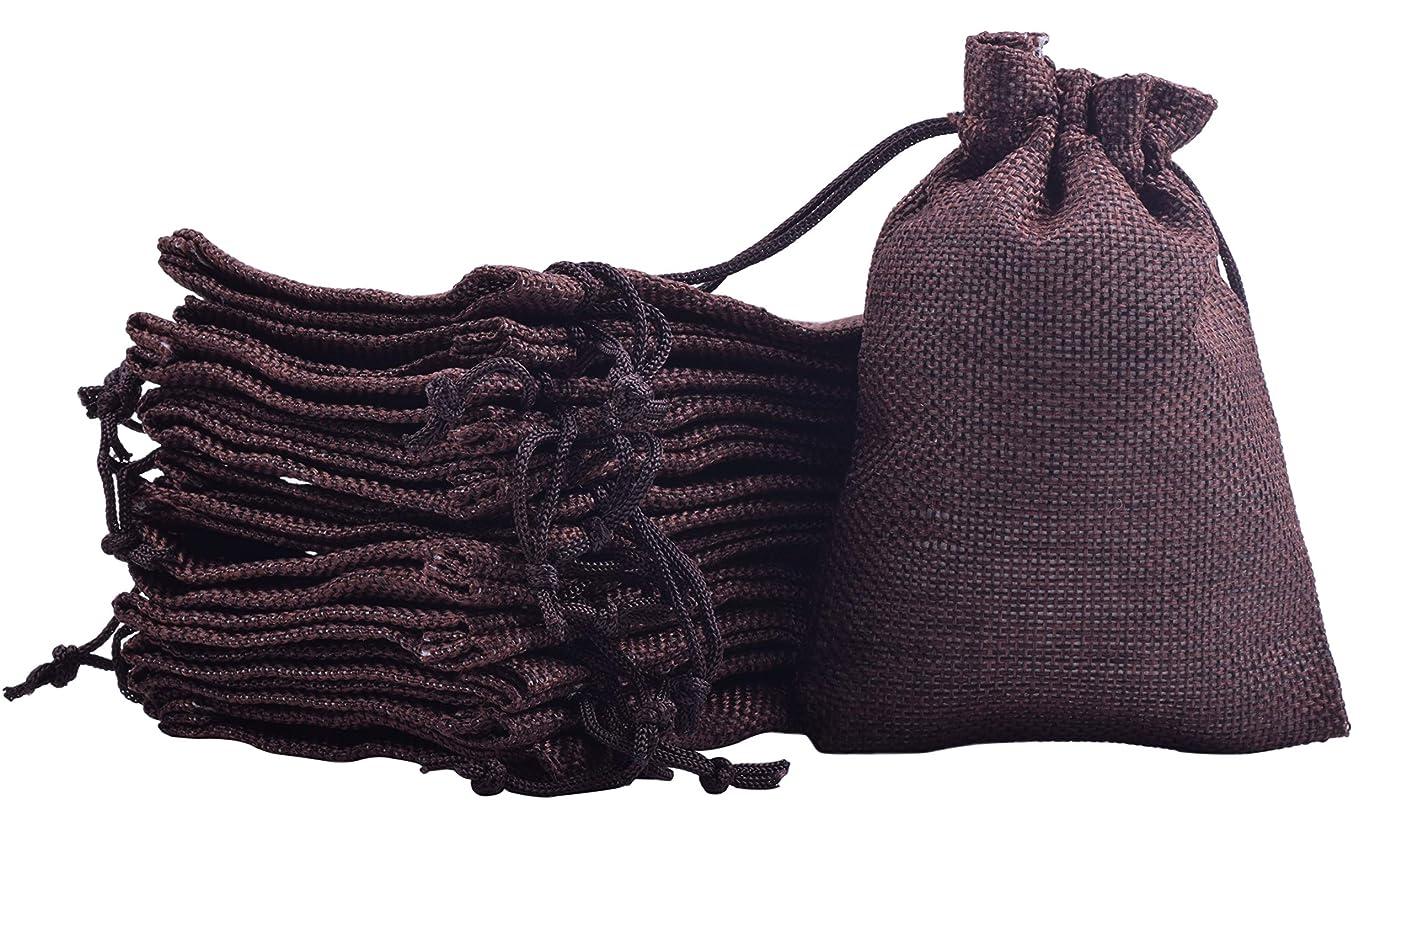 Sansam 50pcs 10cmx14.0cm/4.0''x5.6'' Brown Burlap Gift Bags Draw String Hemp/Hessian Bags, Jewelry Packing Pouches,Wedding Favor Gift Bags